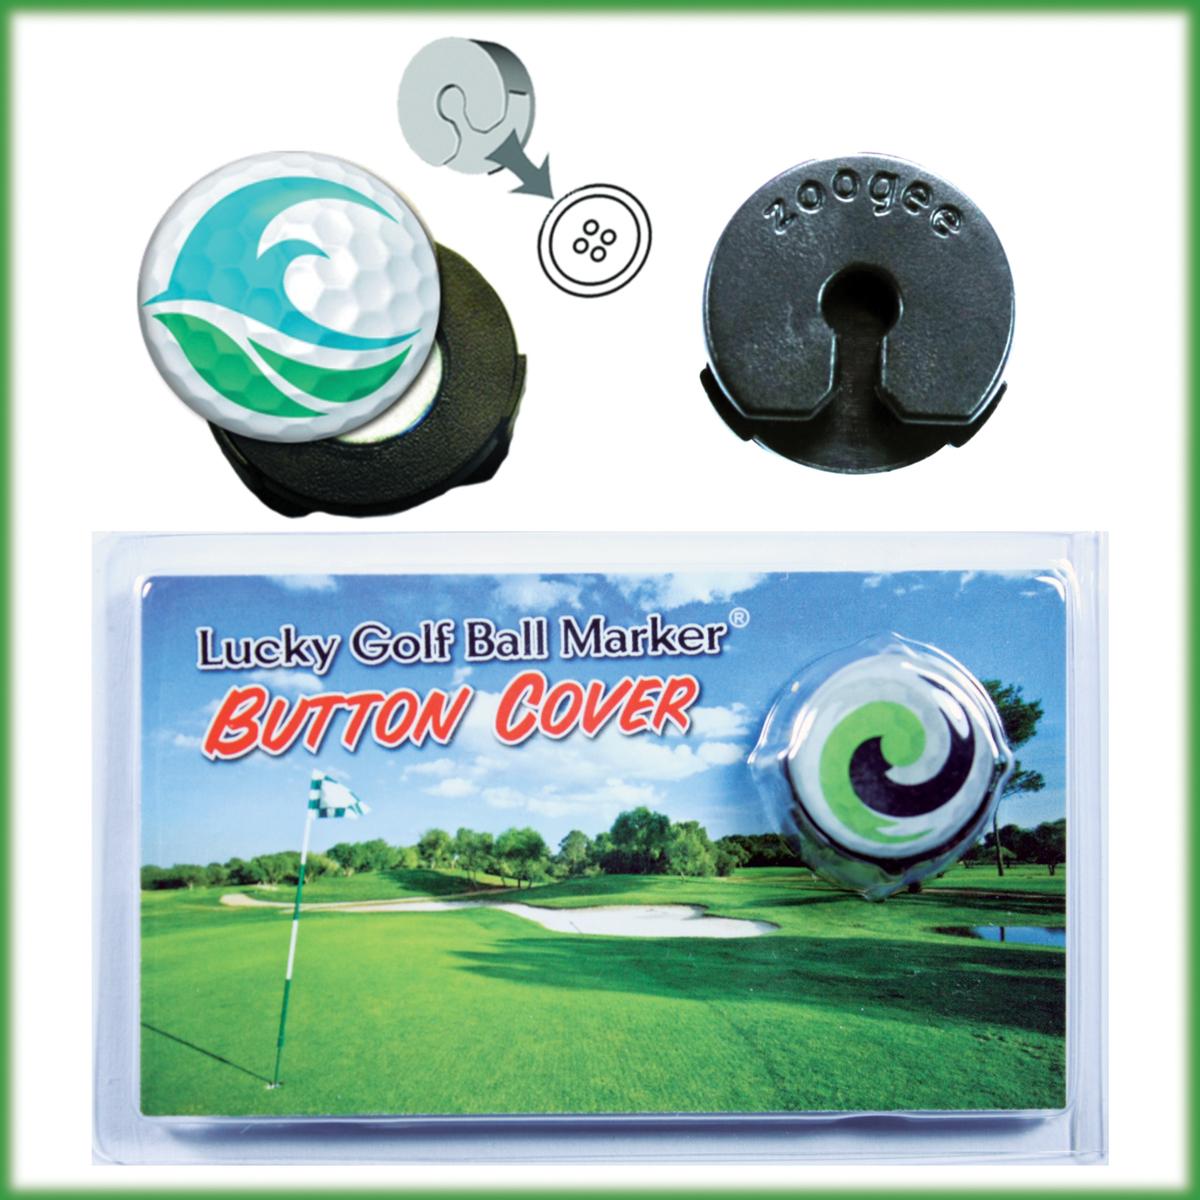 Custom Golf Ball Marker / Magnet Button Cover